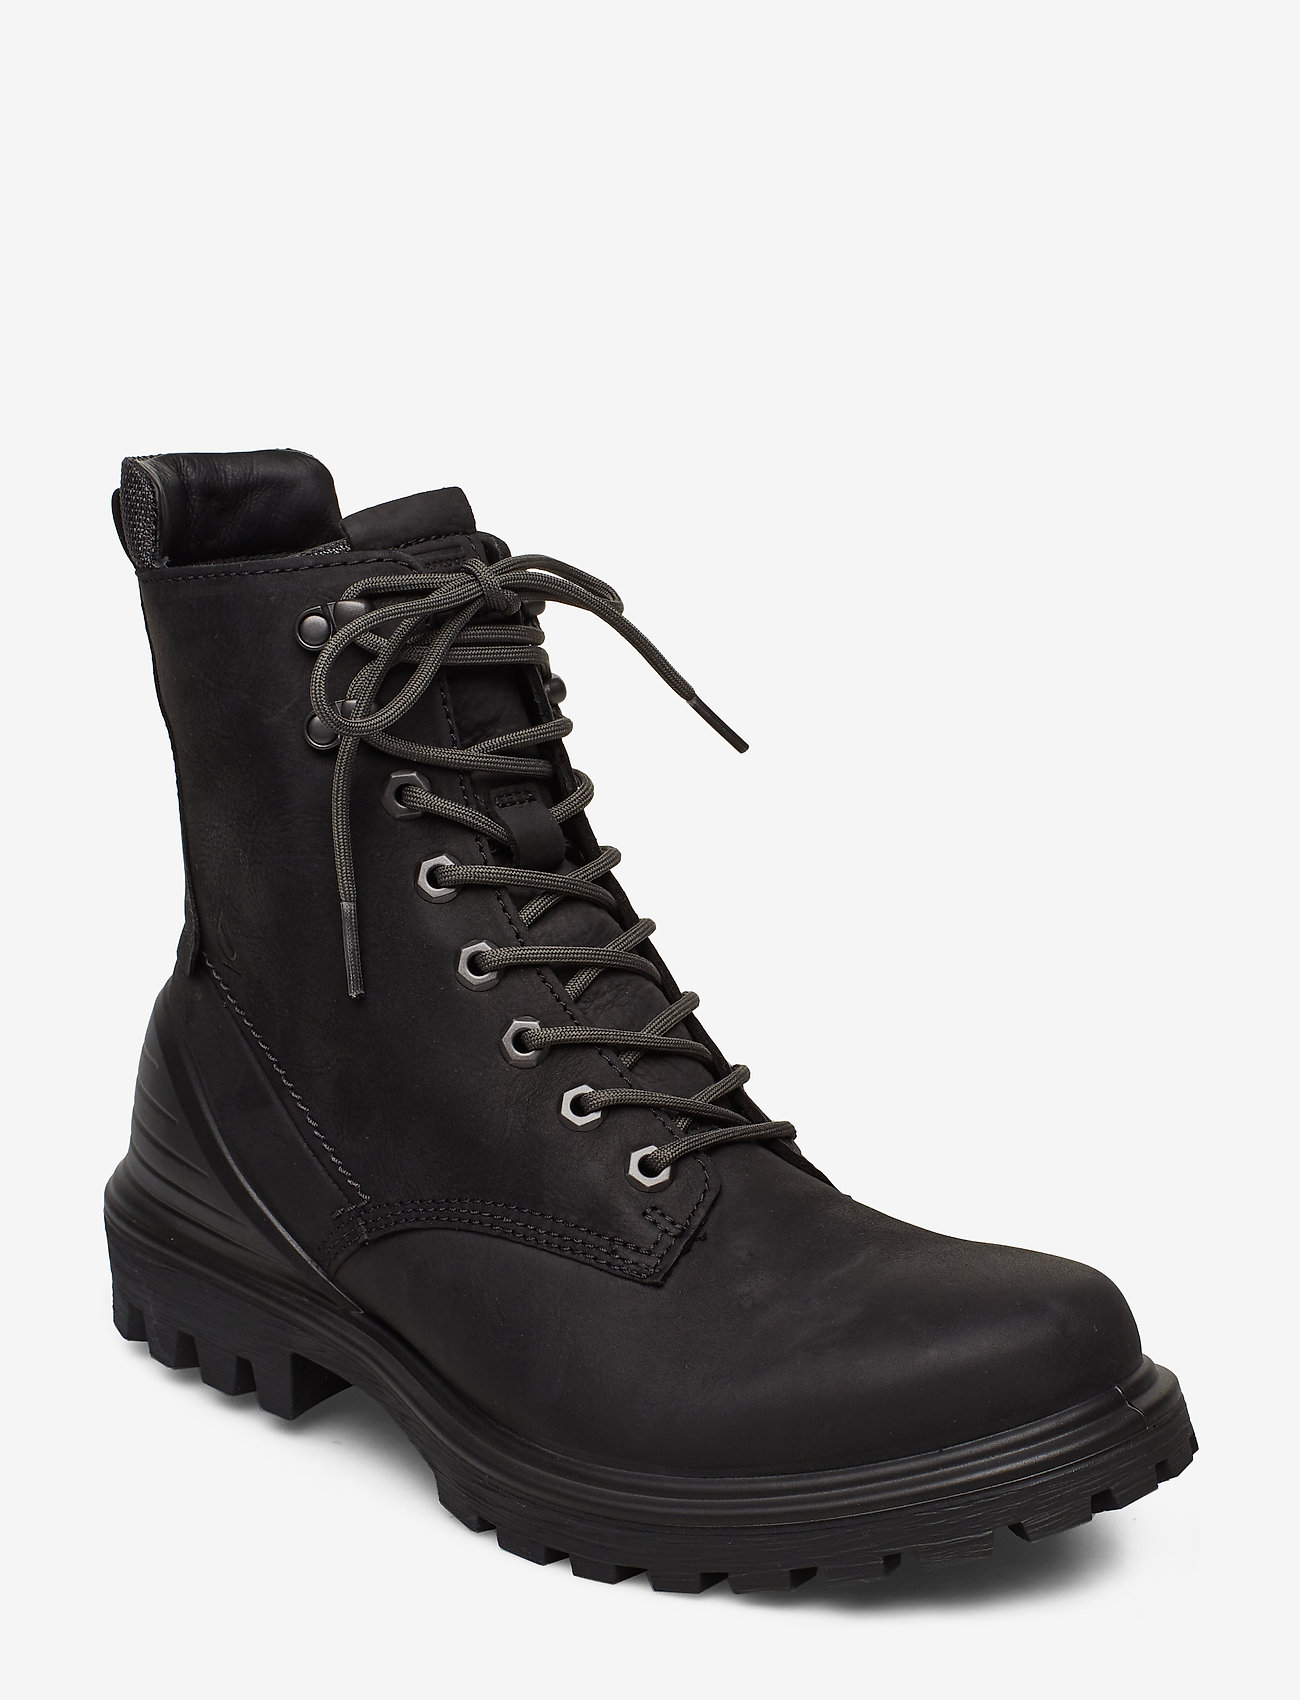 ECCO - TREDTRAY M - laced boots - black - 0